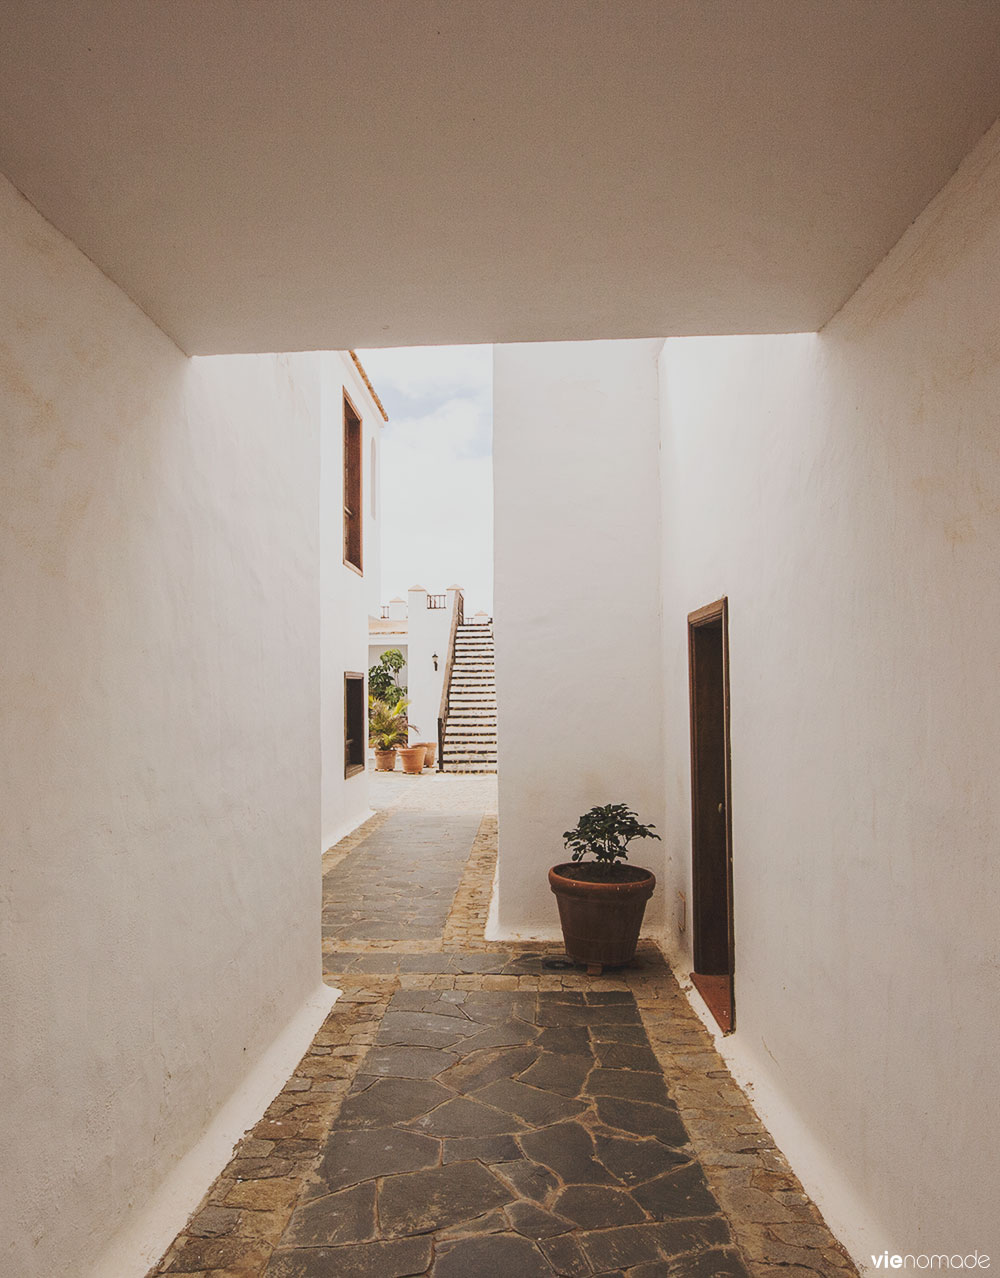 Musée de l'artisanat à Antigua, Fuerteventura